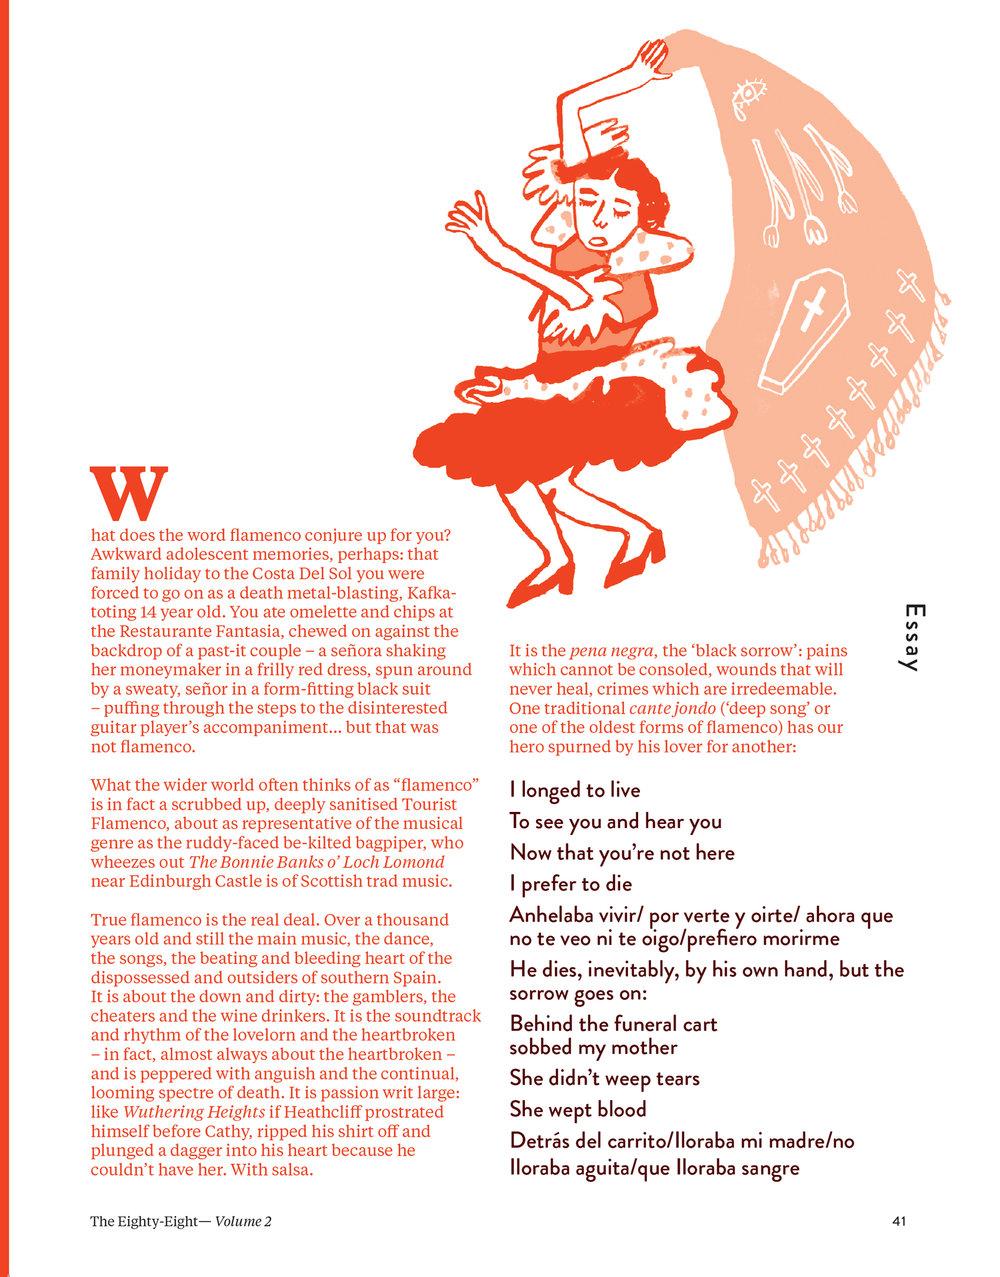 41_the88_flamenco copy.jpg